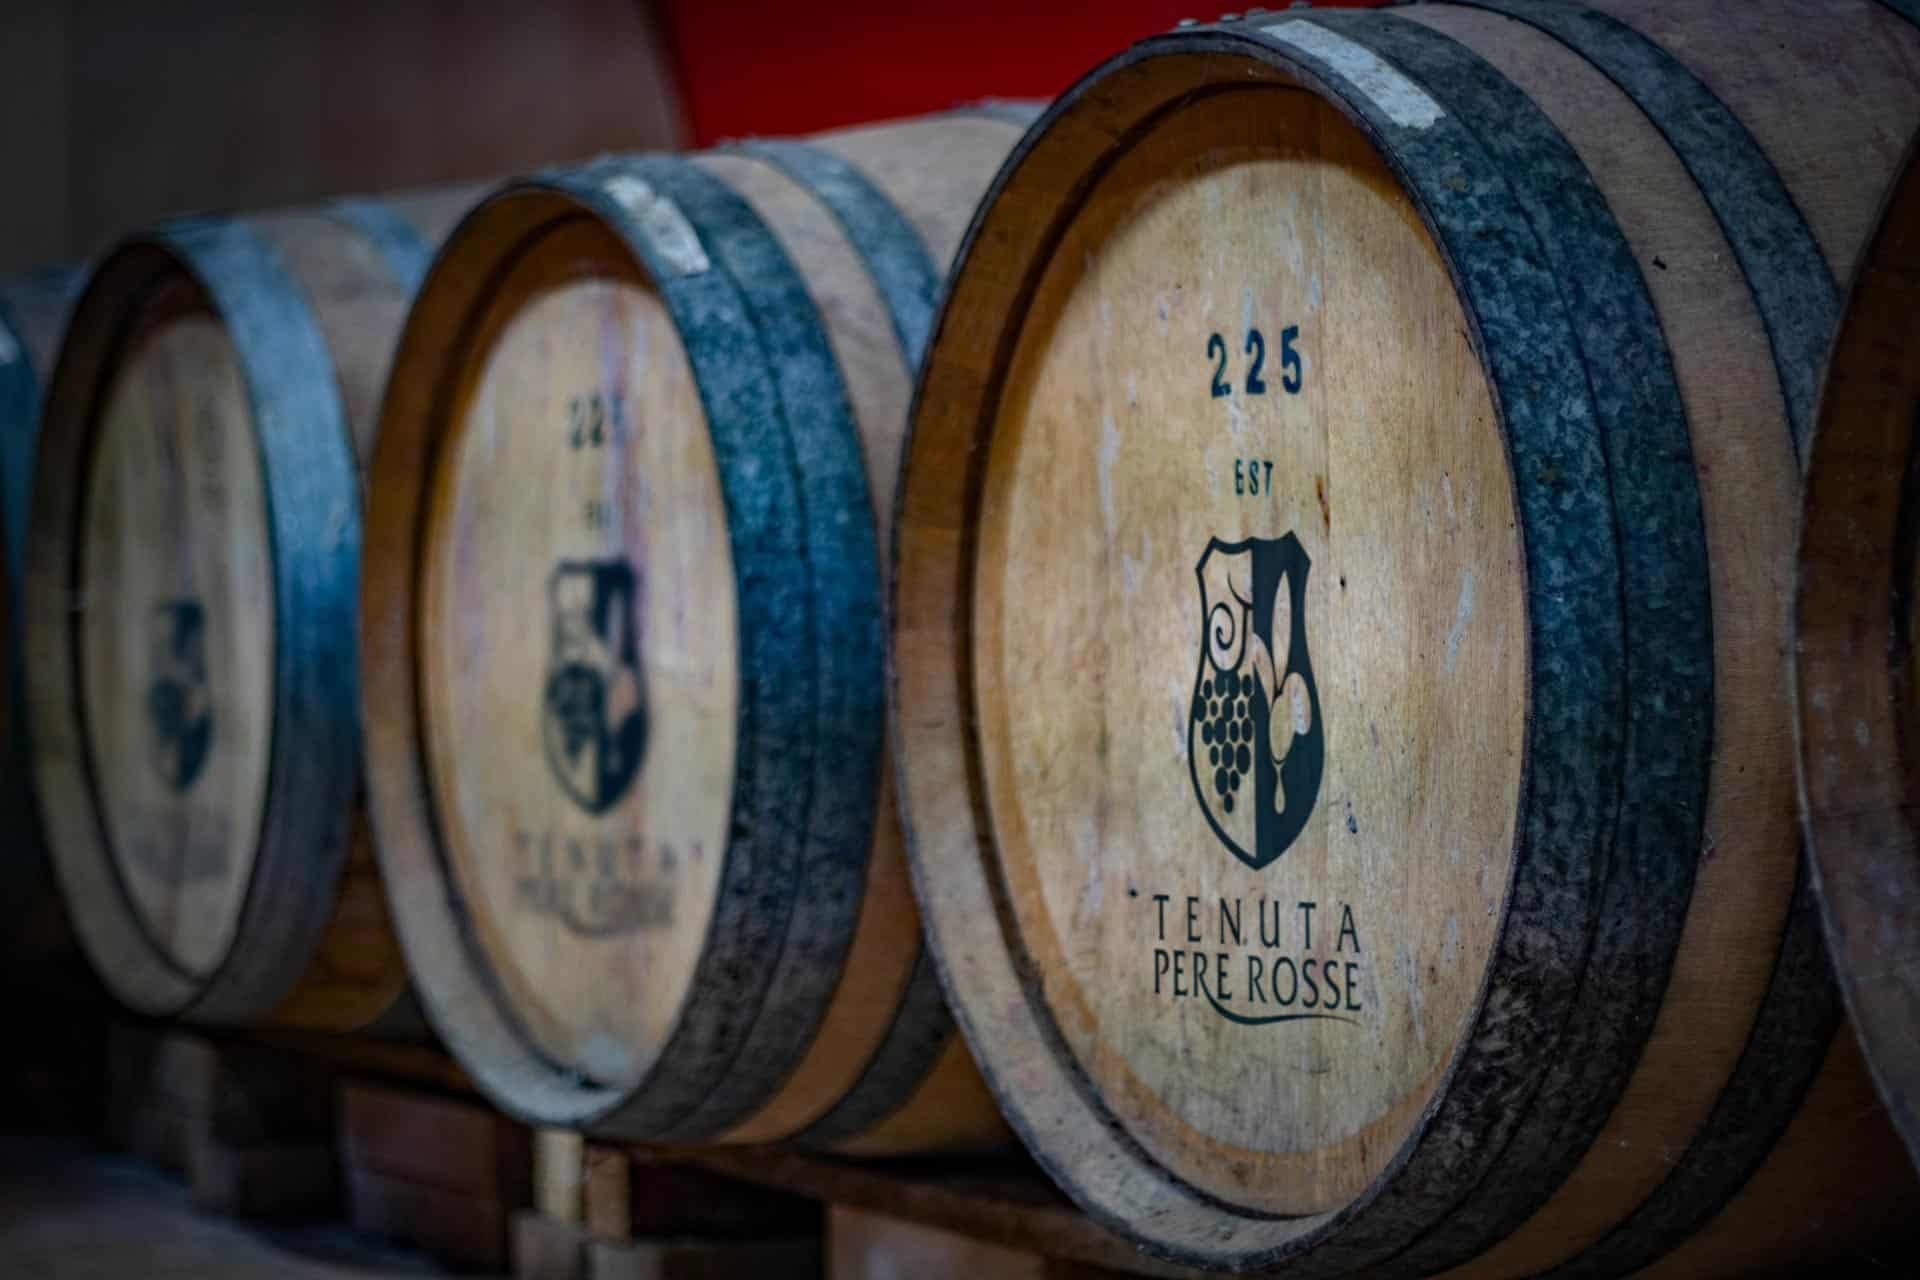 vinfiicazione-in-botti-azienda-vinicola-tenuta-pere-rosse